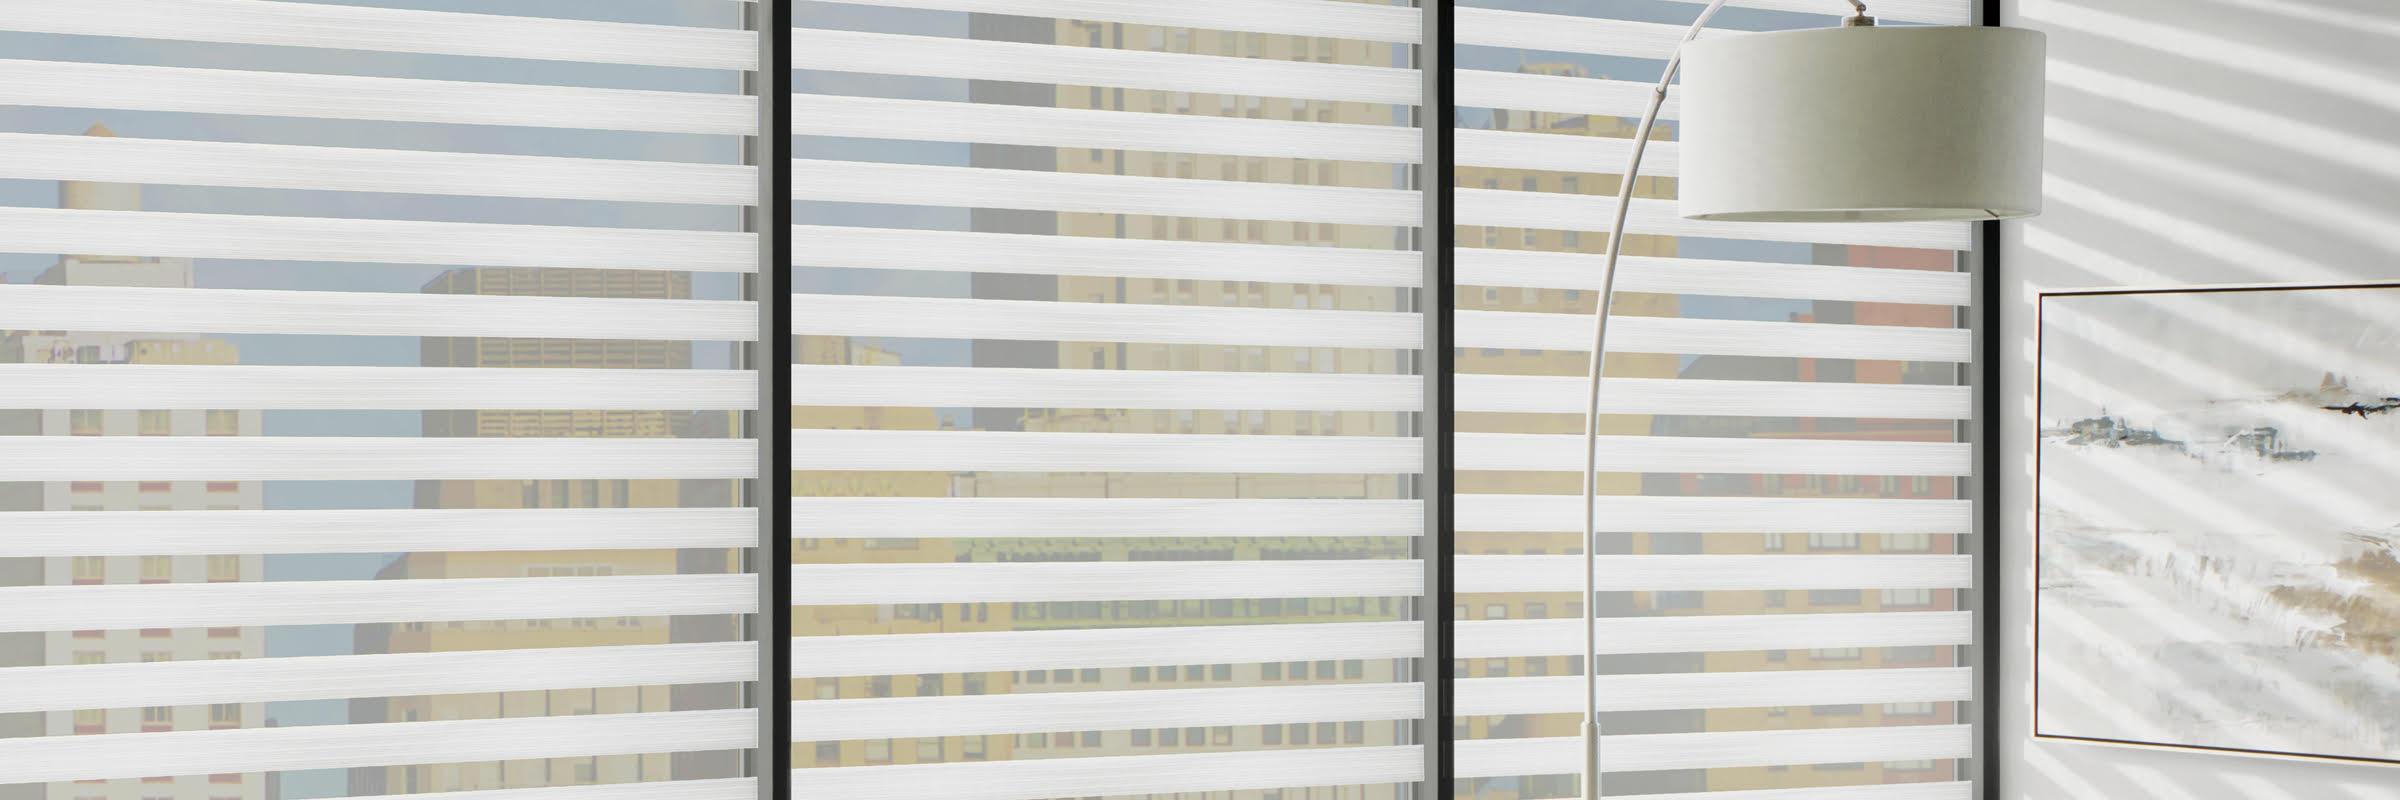 Banded sheer shades in Buckingham Organza - Designer Banded Shades